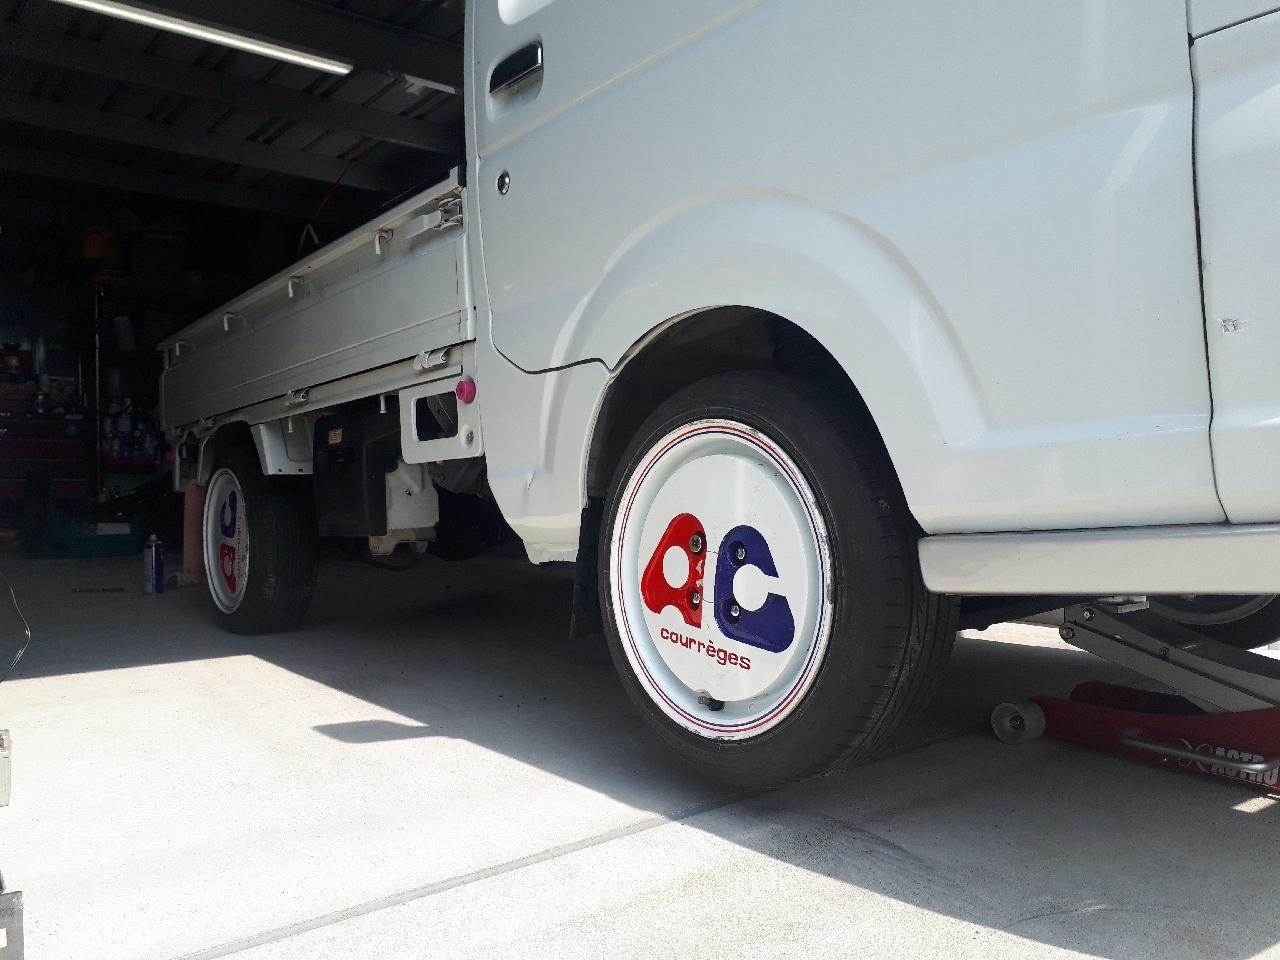 AC courreges ACB-R